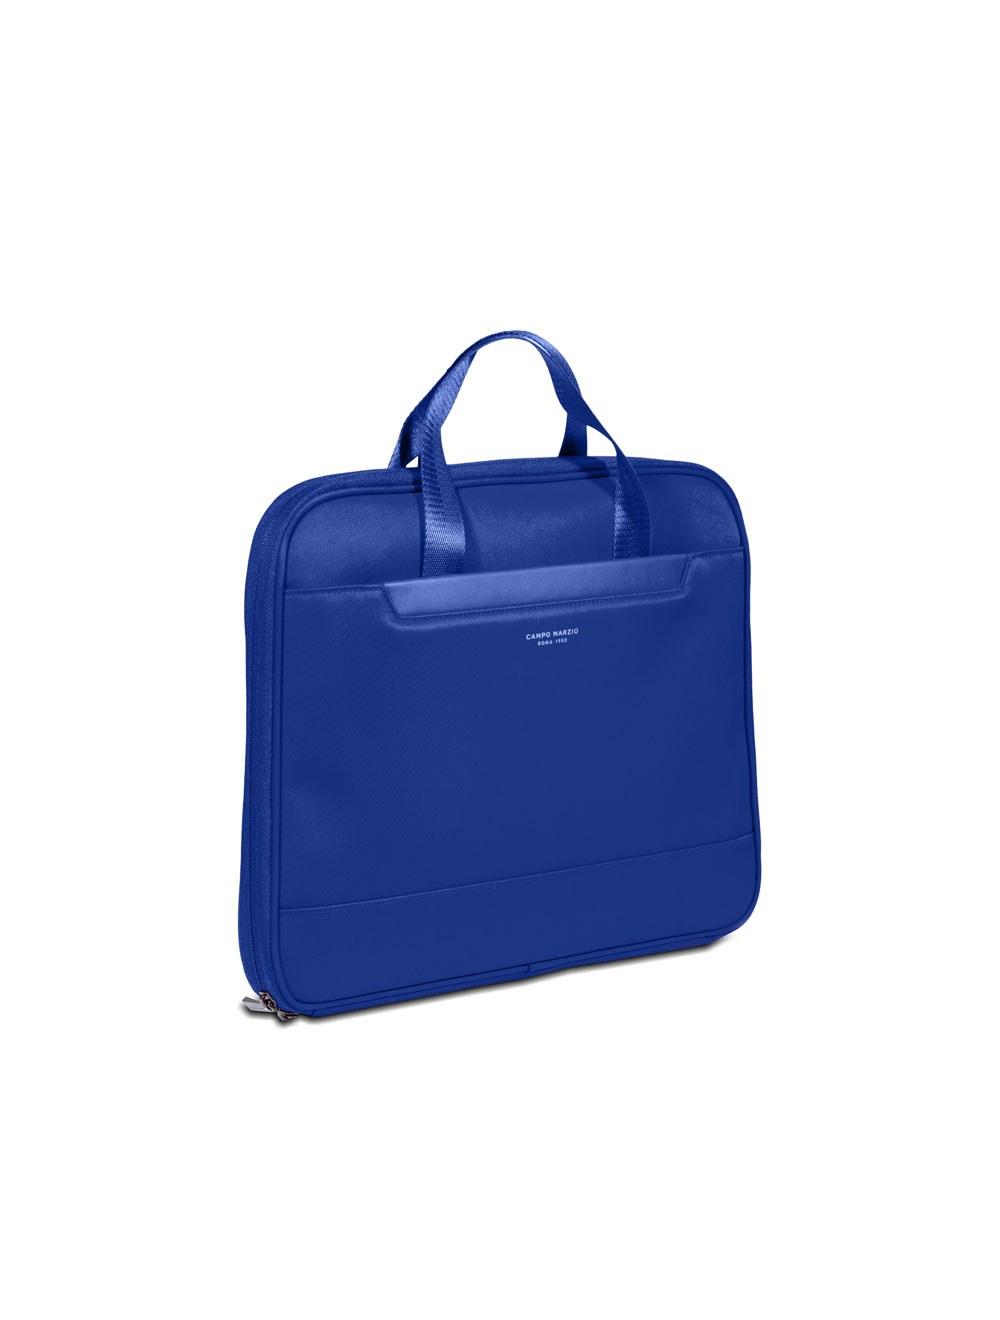 "Laptop Holder 15"" Slim - Blueberry"